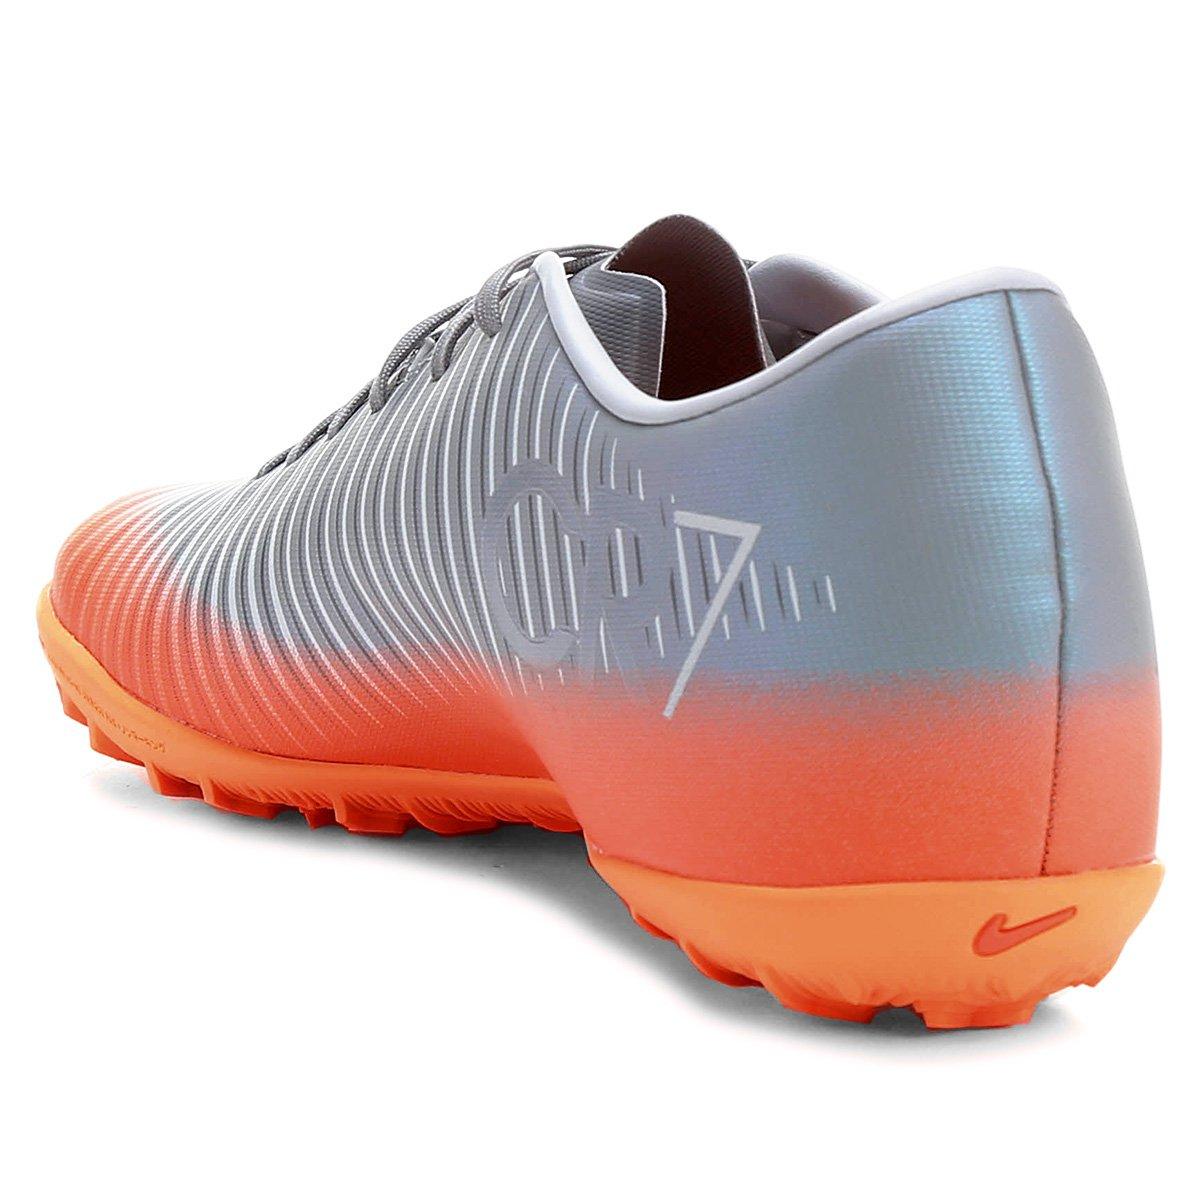 Chuteira Society Nike Mercurial X Victory 6 CR7 TF - Compre Agora ... d1e529dd61fc8